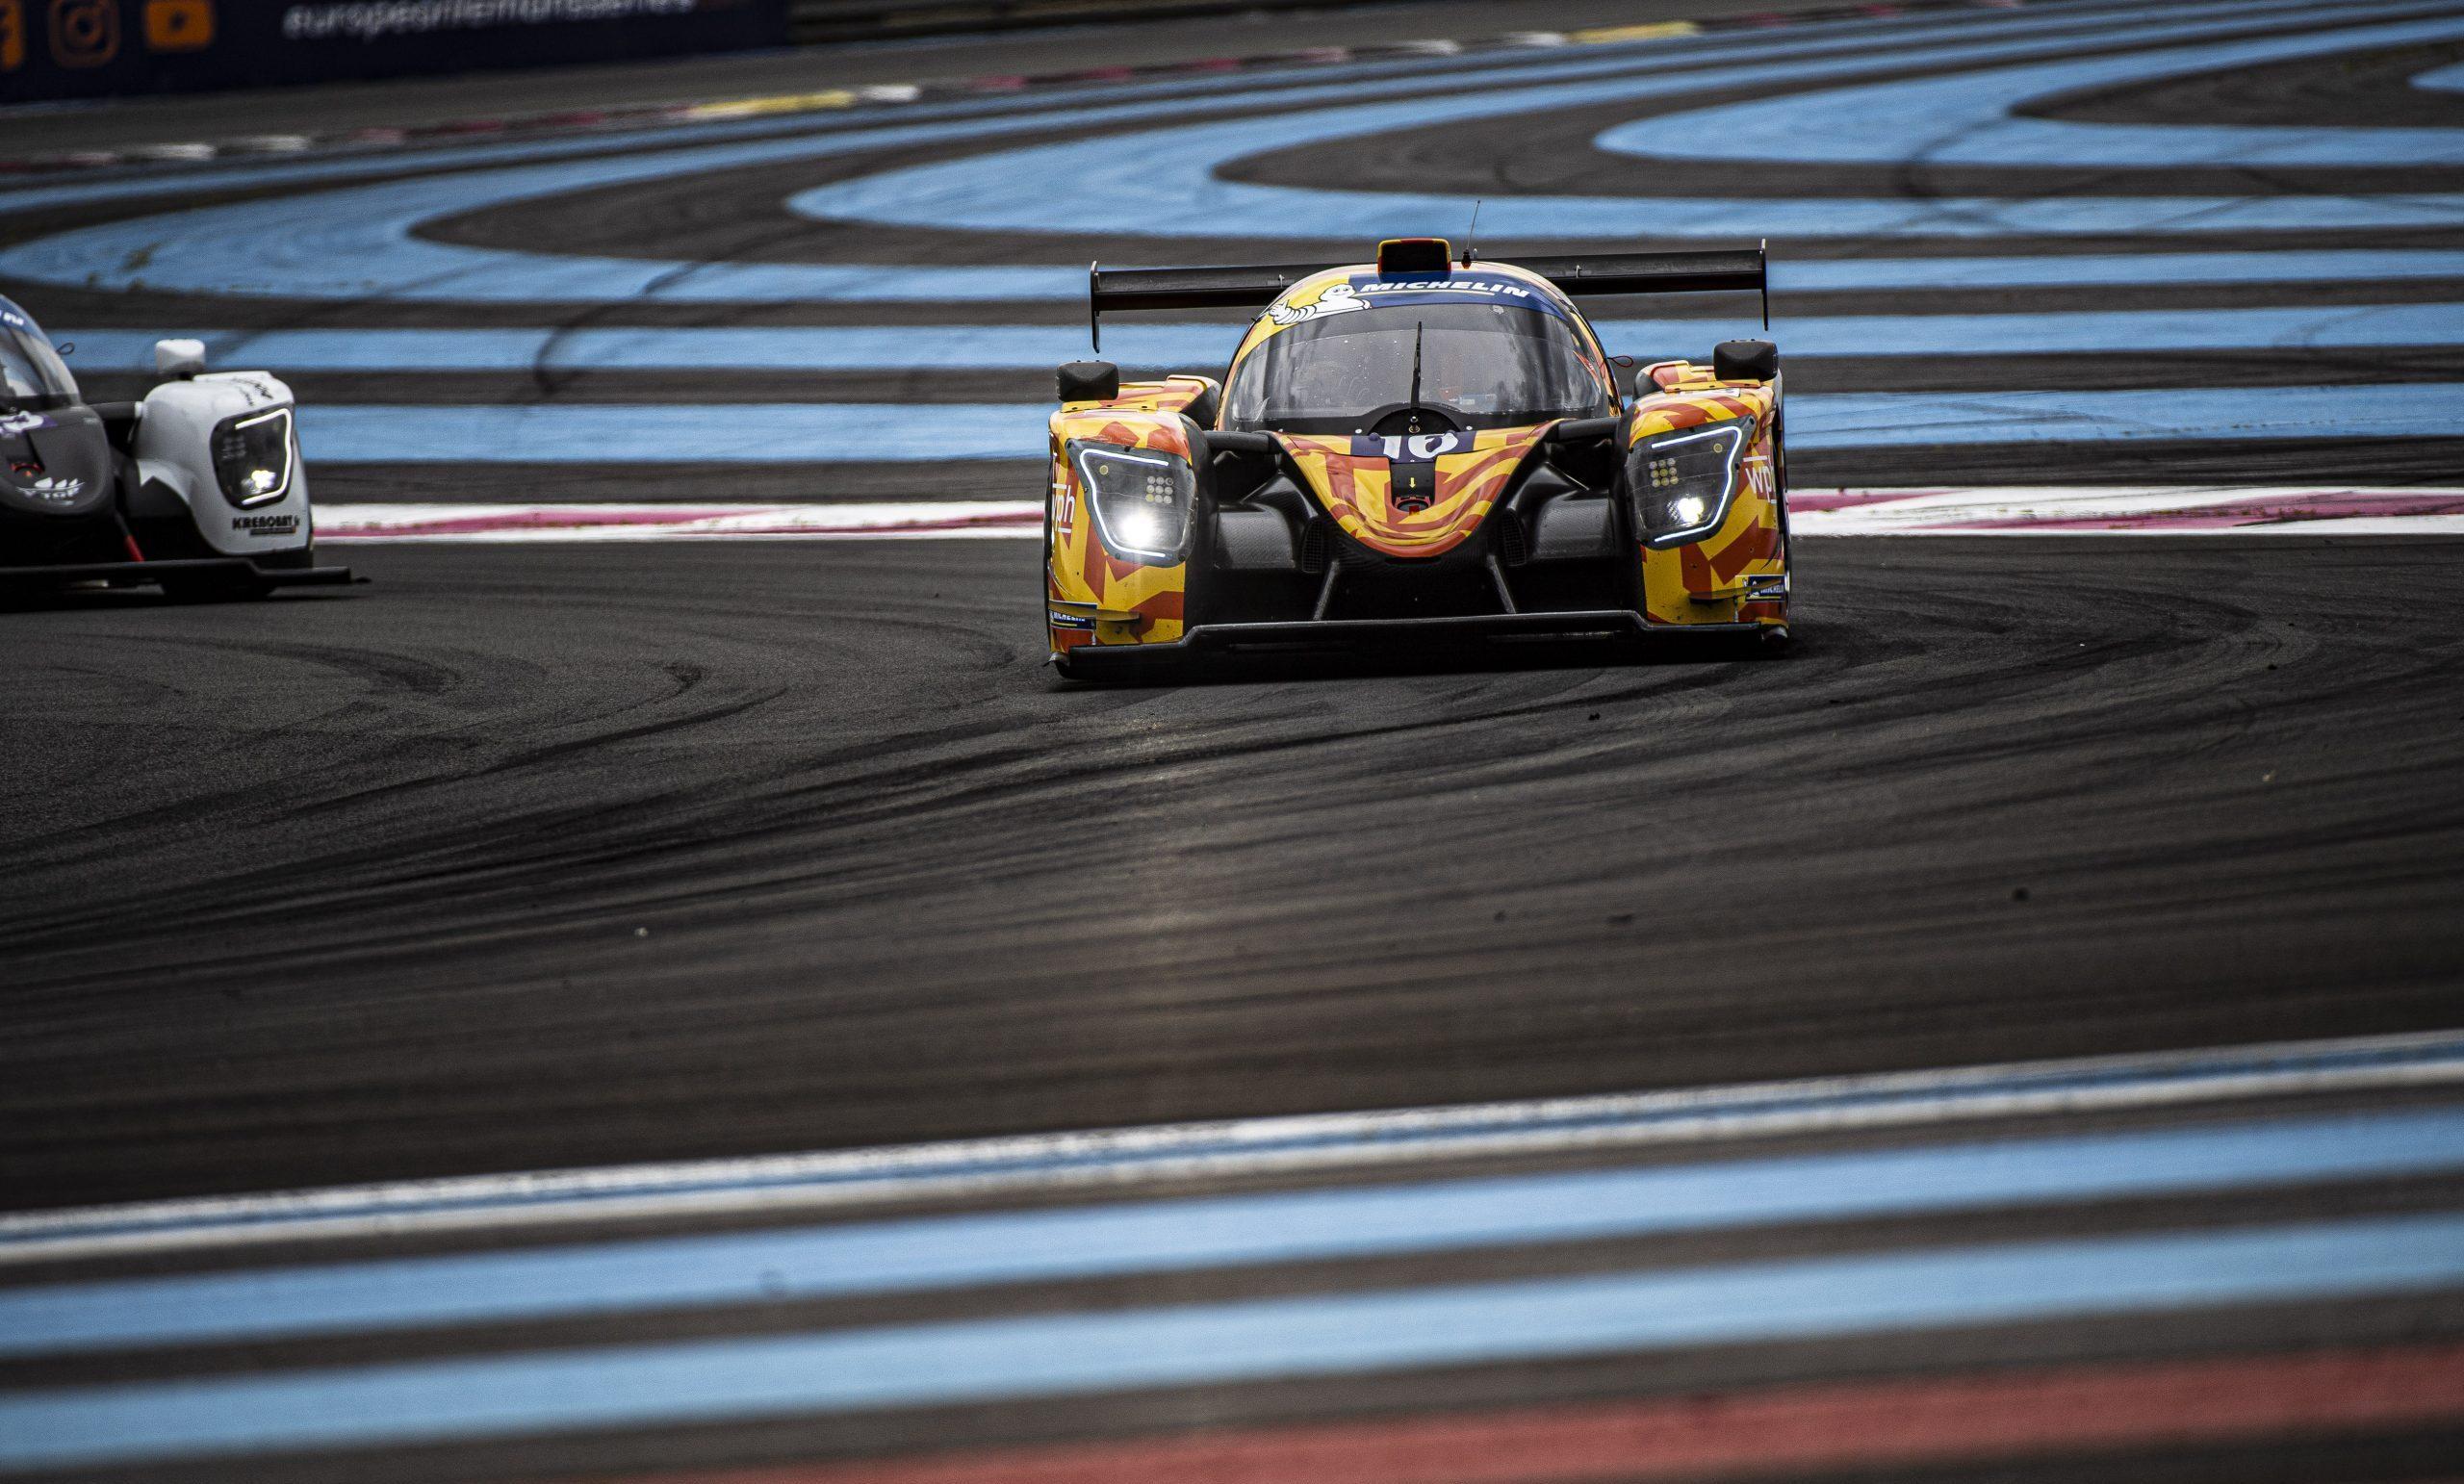 Challenging Le Mans Cup race for Team Virage in Le Castellet